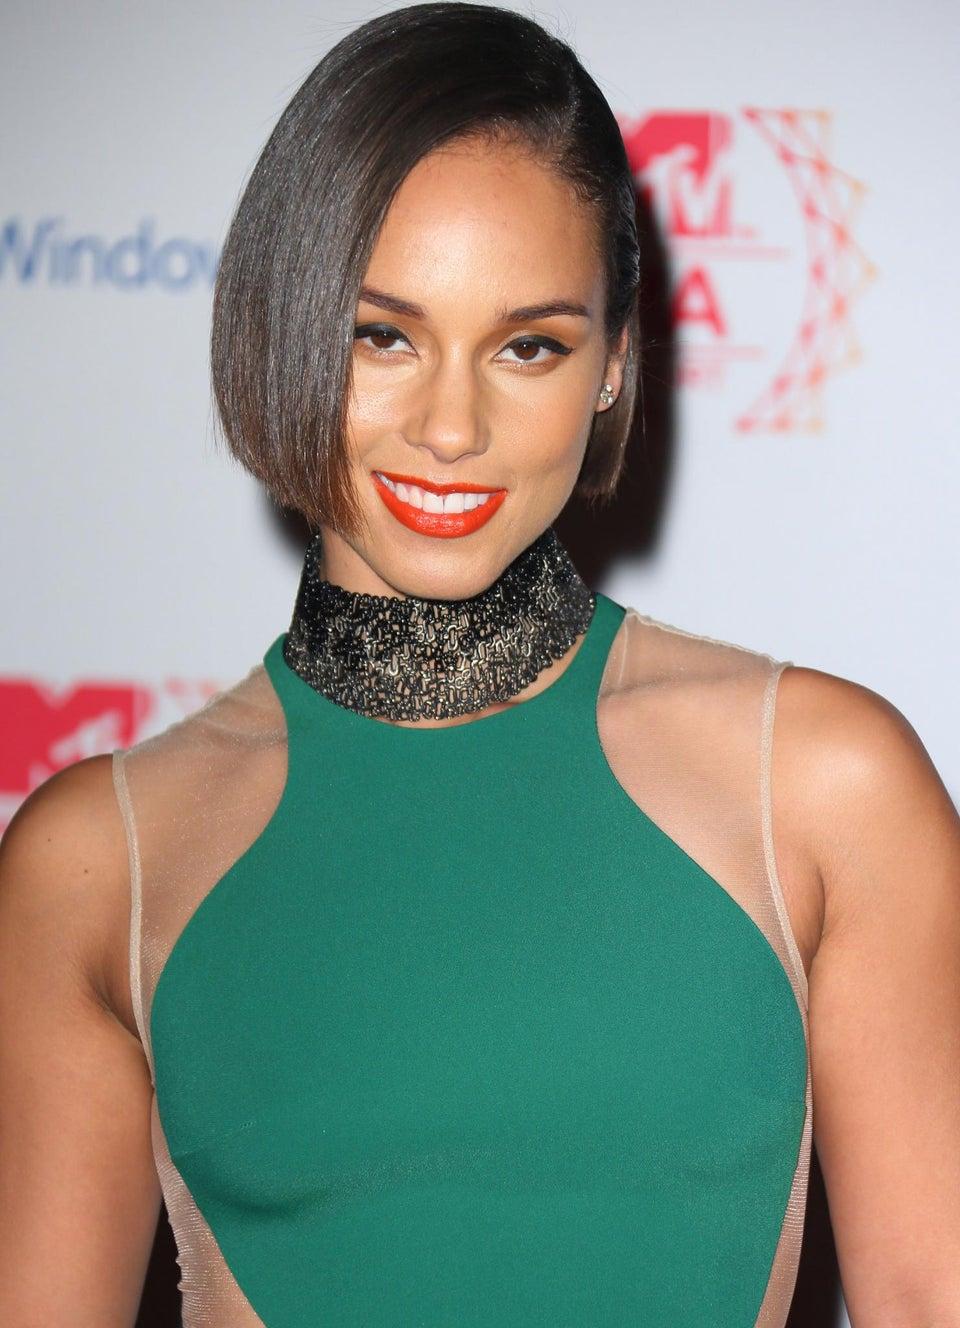 Alicia Keys Shares Concern Over Rihanna